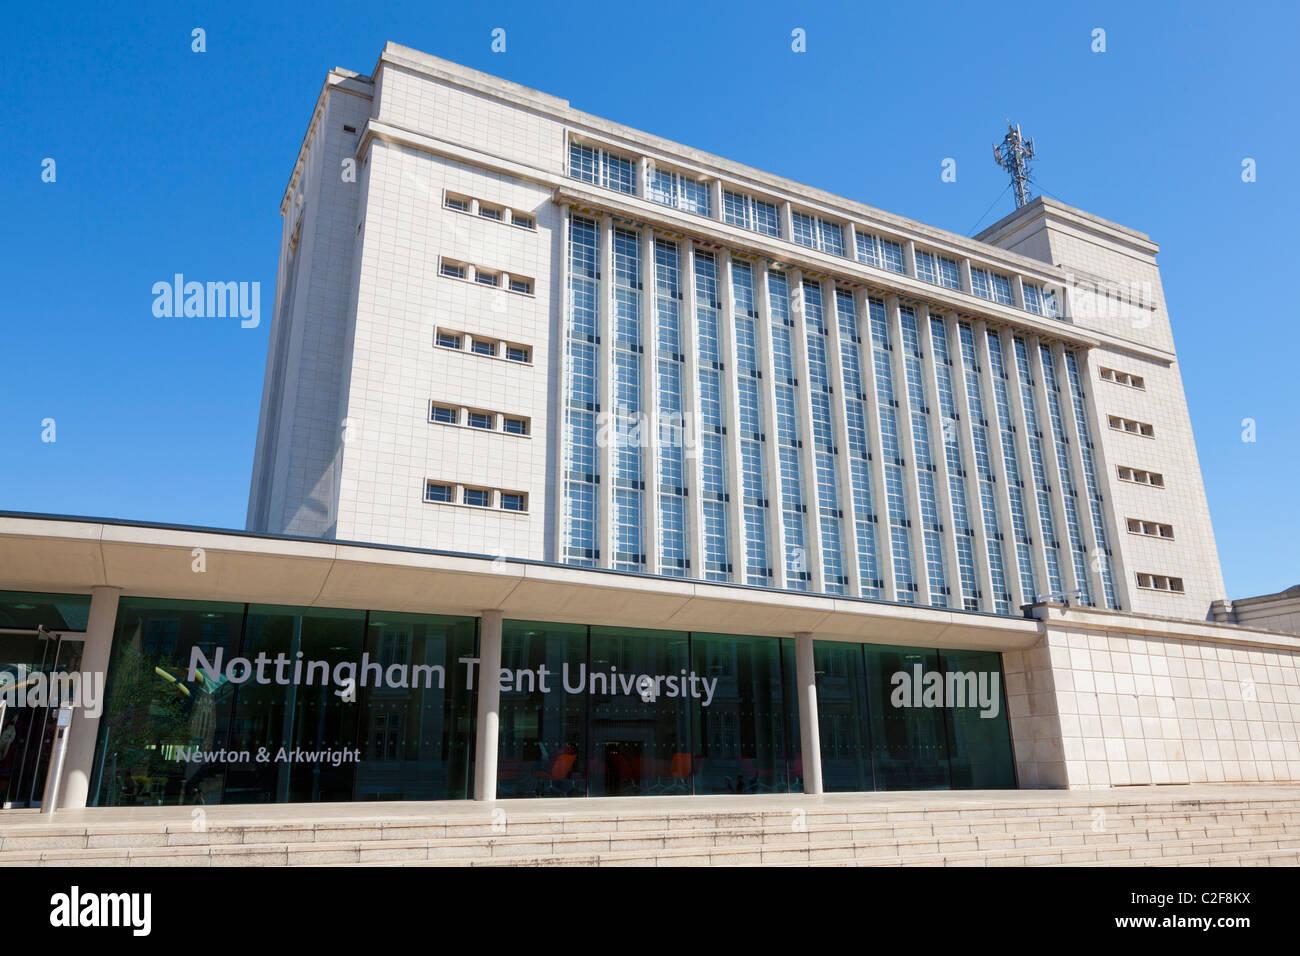 Newton e Arkwright edifici, Nottingham Trent University, Nottingham, Regno Unito Immagini Stock